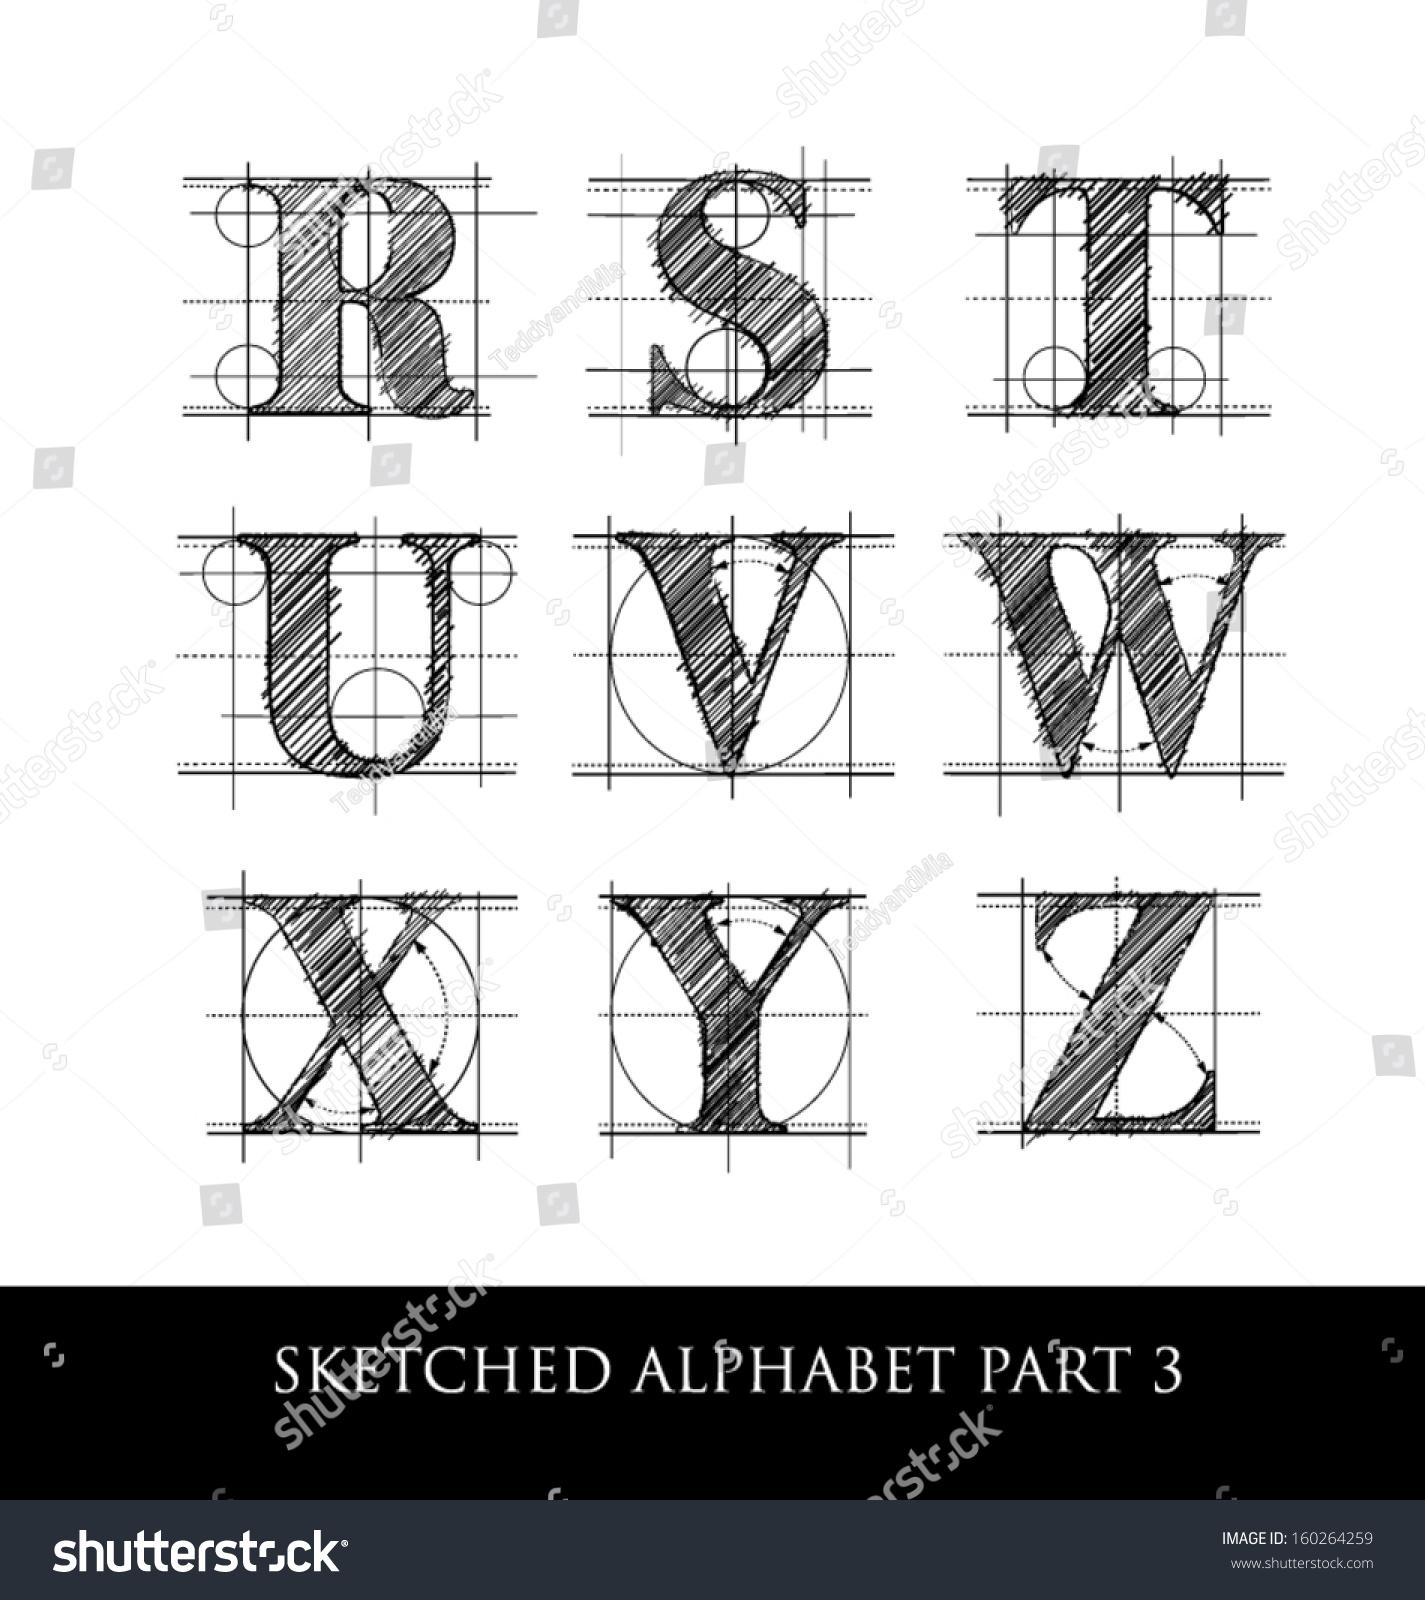 architectural sketched letters set 1 stock vector illustration